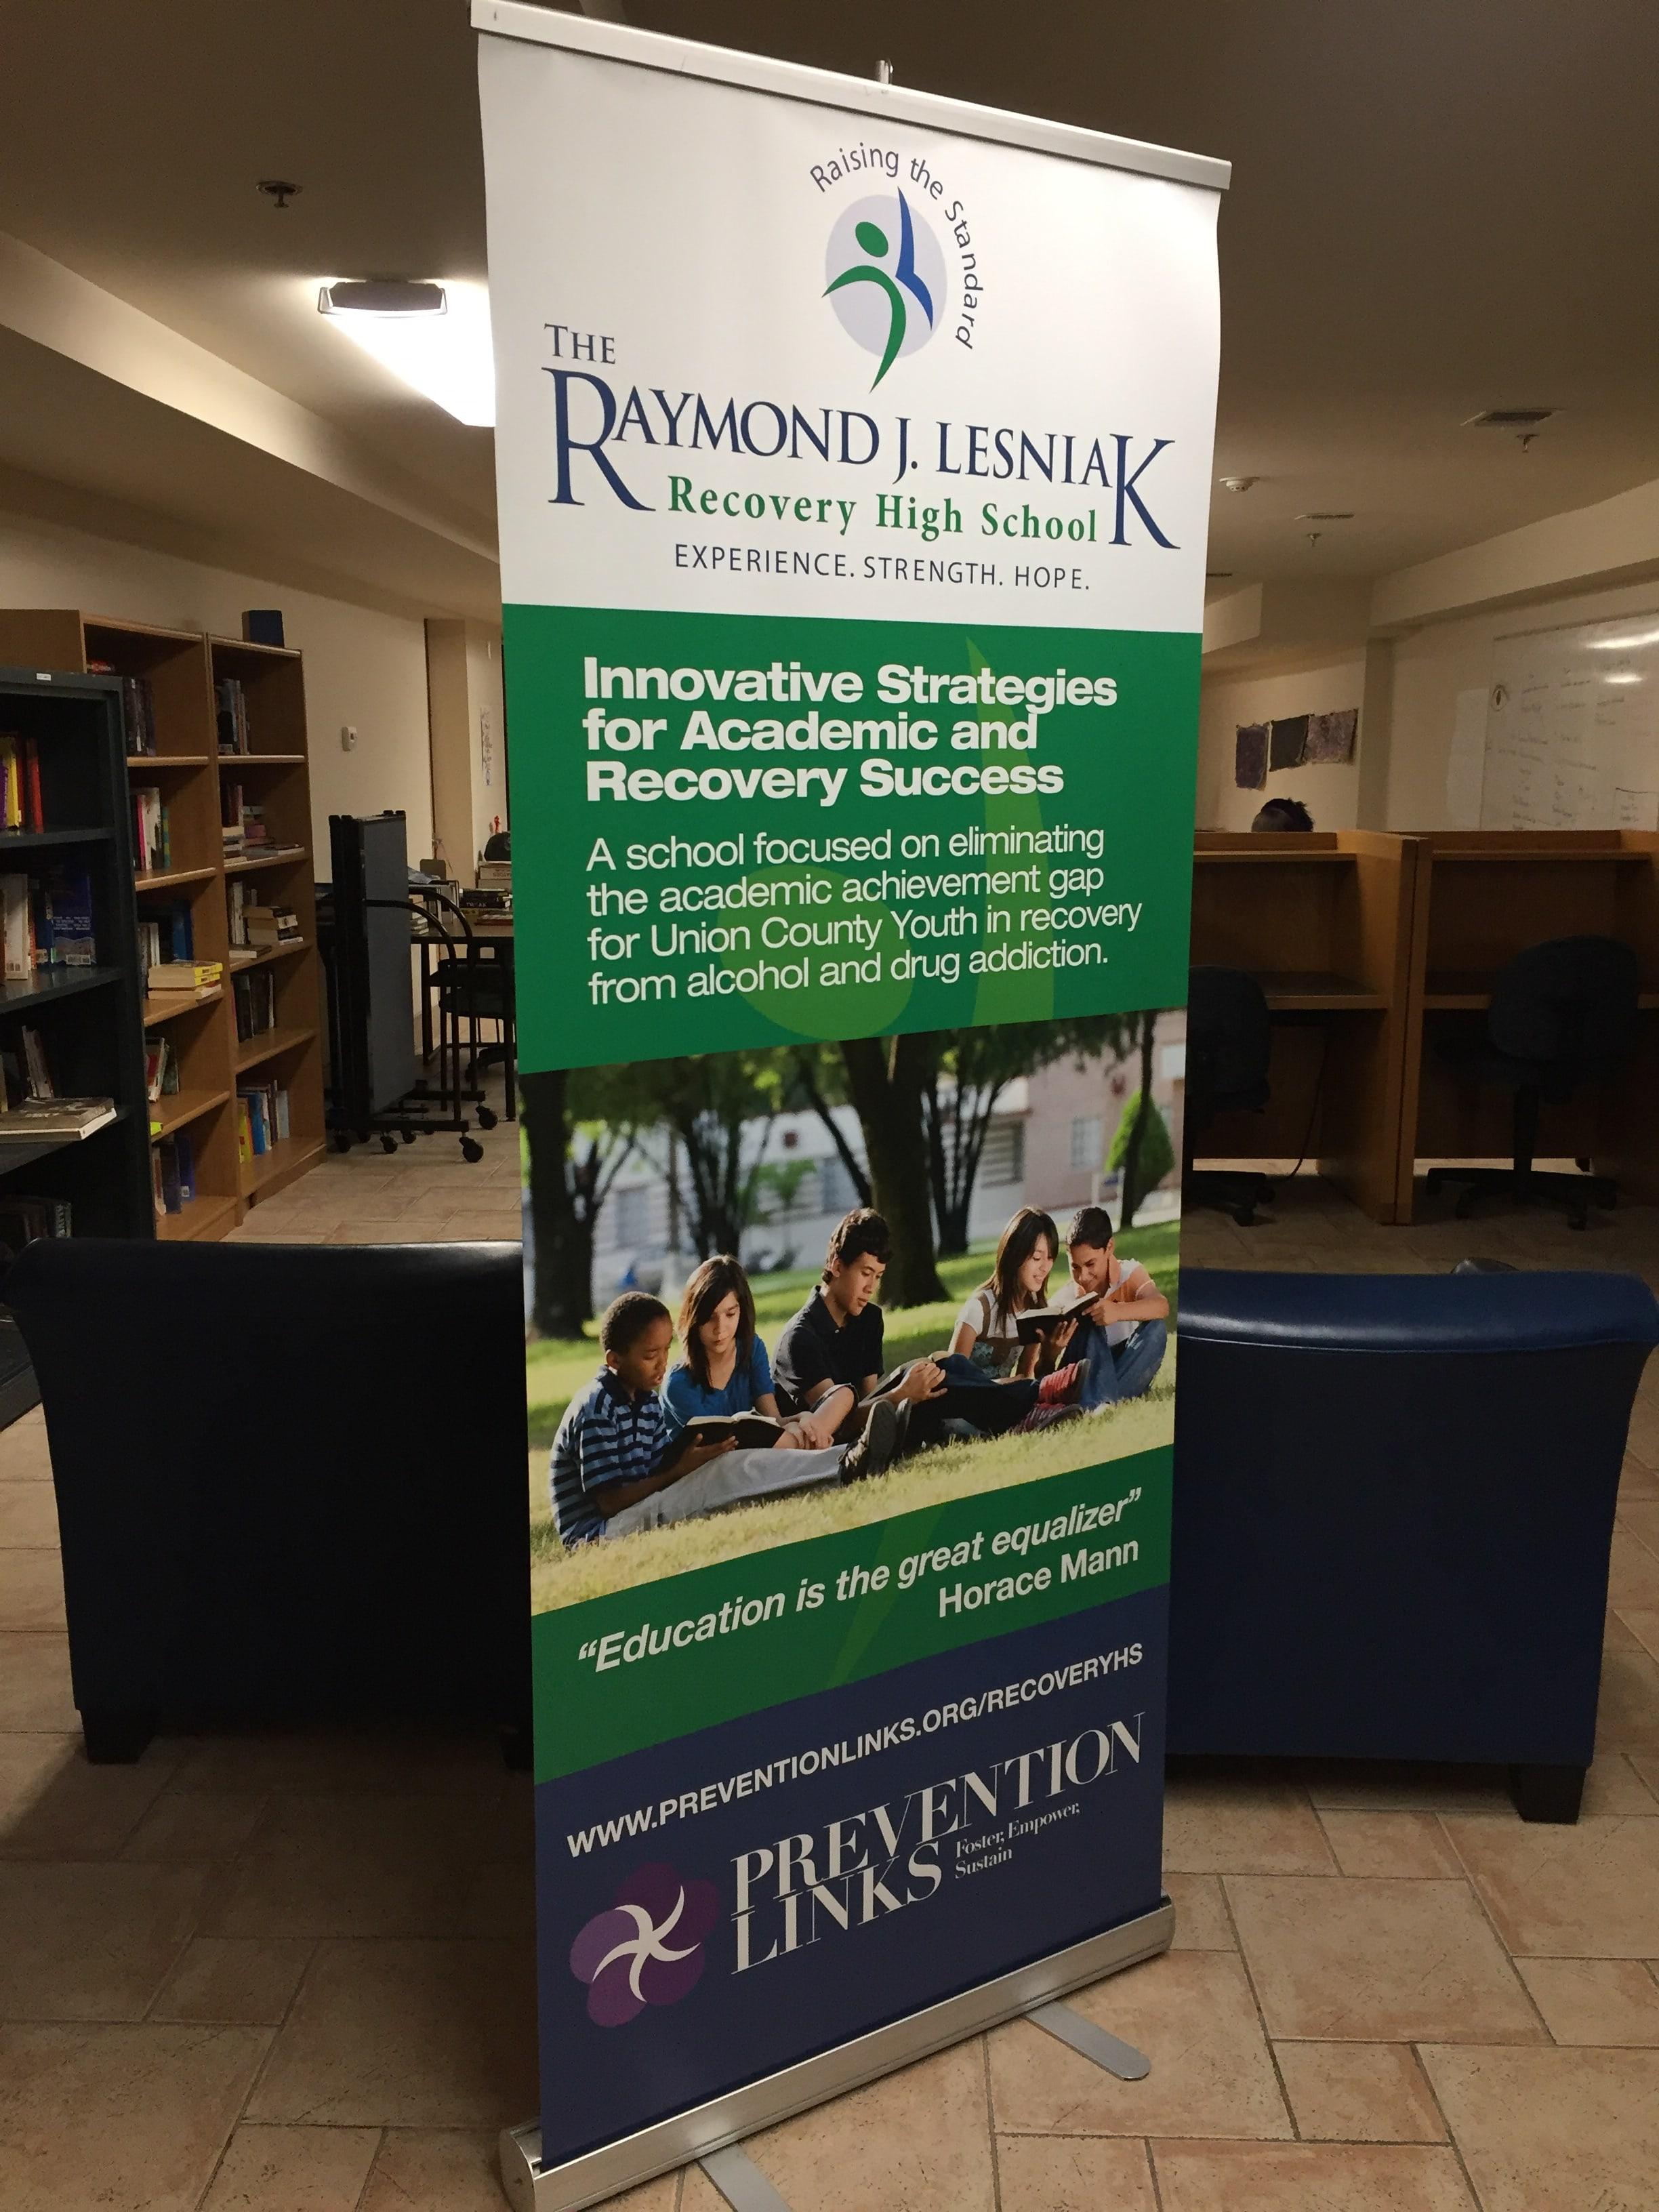 The Raymond J. Lesniak Recovery High School Sign